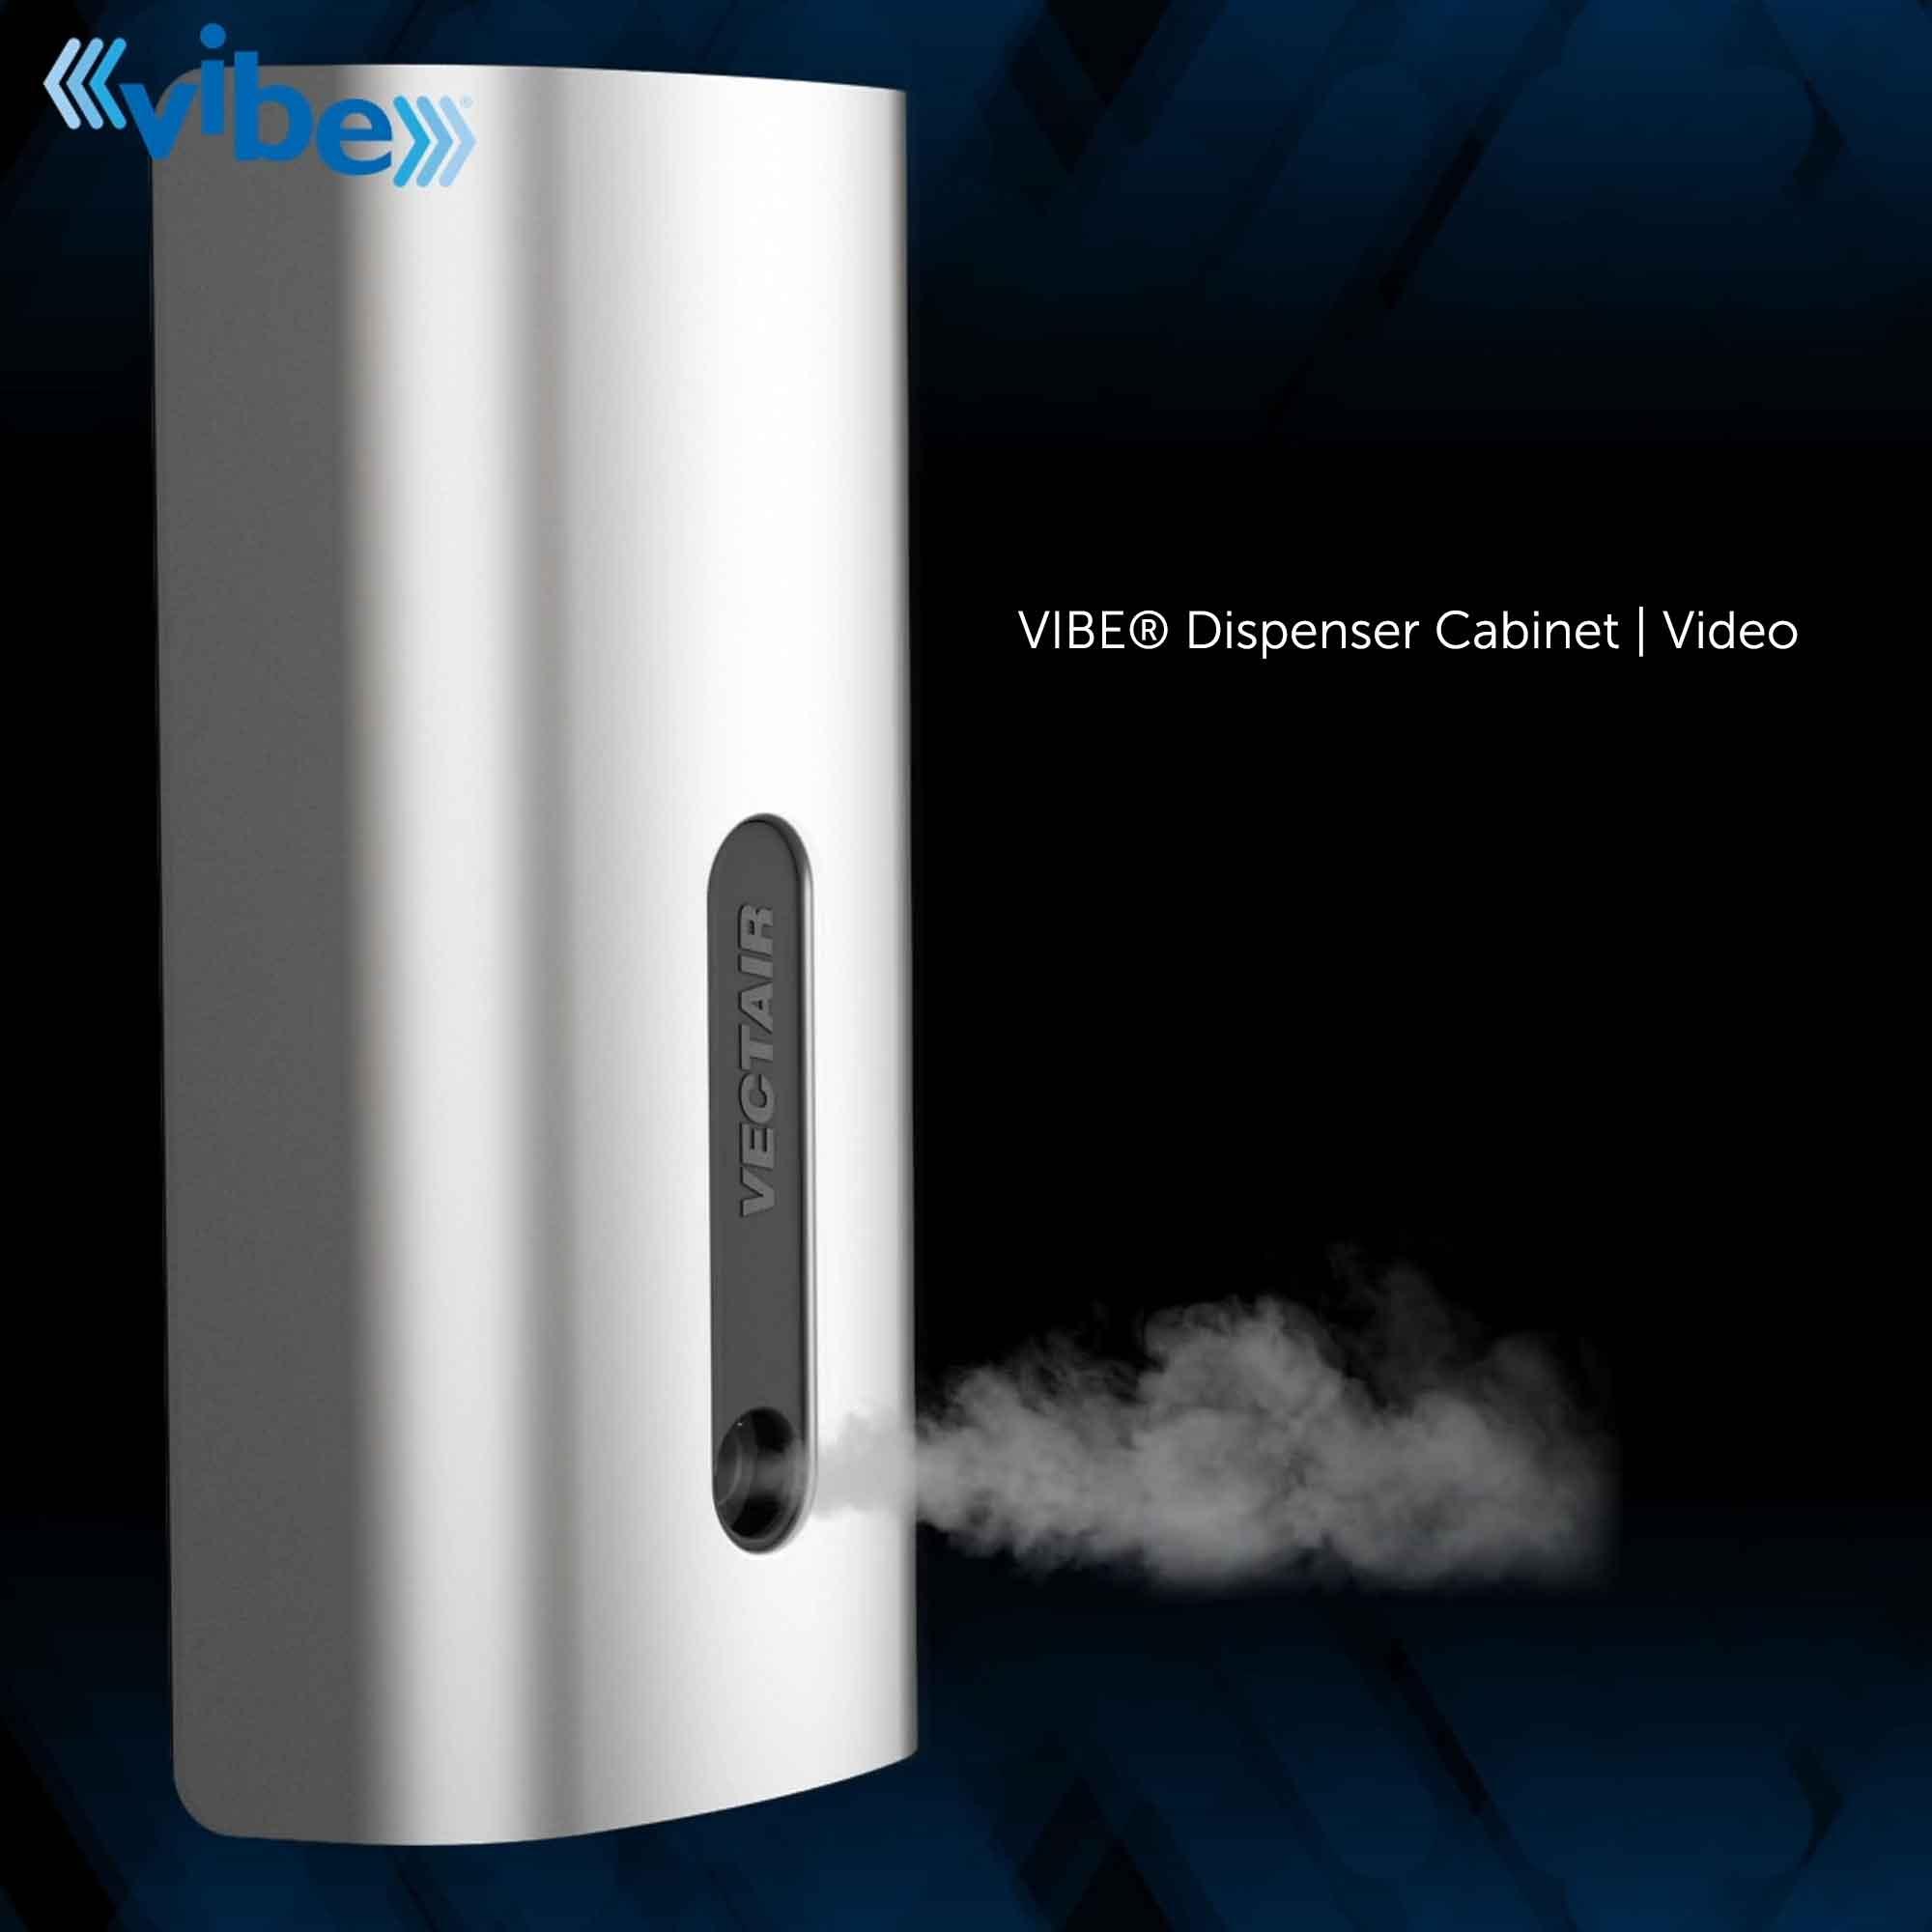 VIBE® Dispenser Cabinet | Video